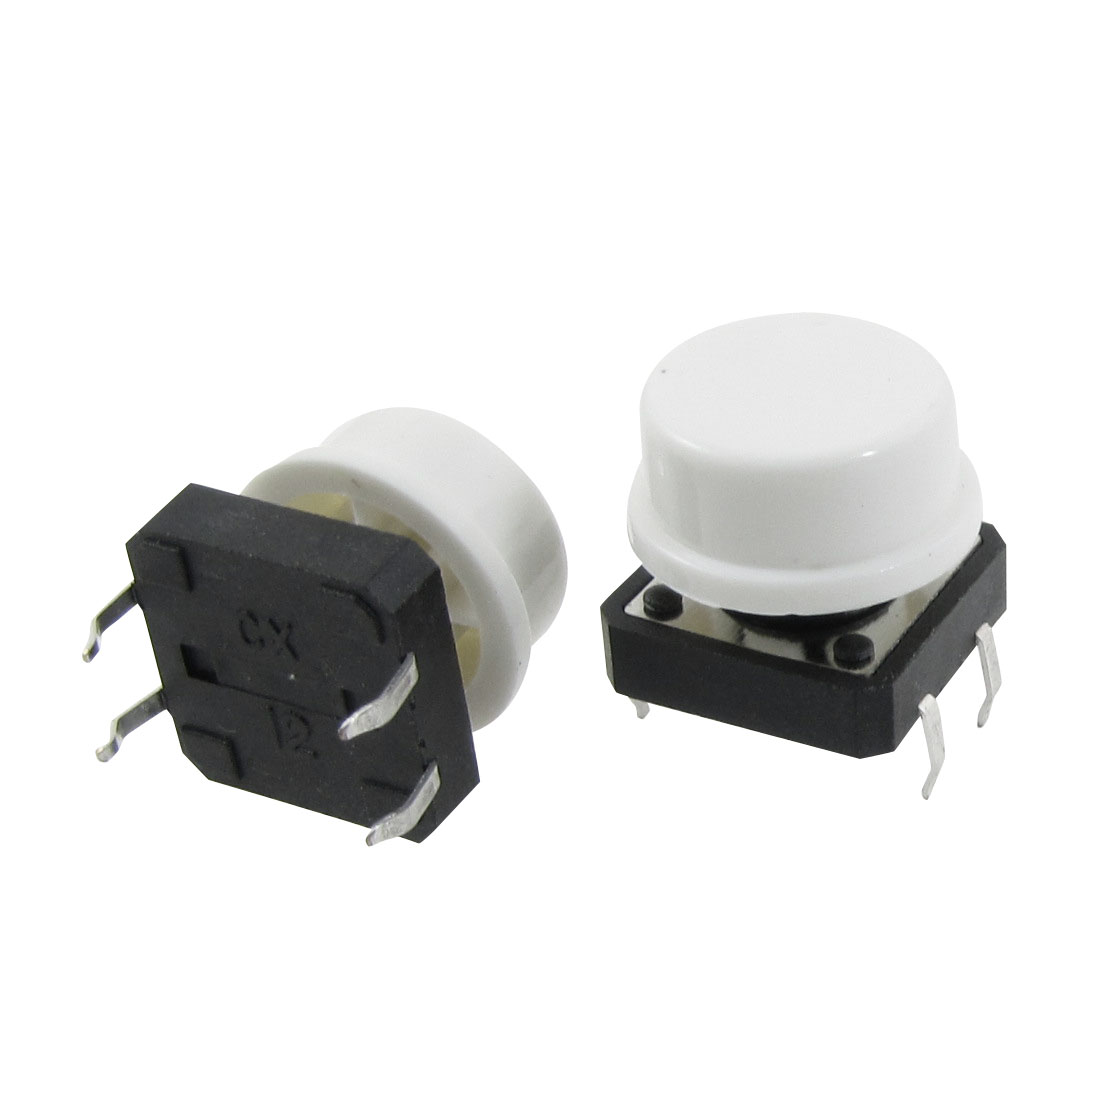 20x Momentary Tactile Push Button Switch 12x12x11mm 4 Pin DIP Through Hole w Cap